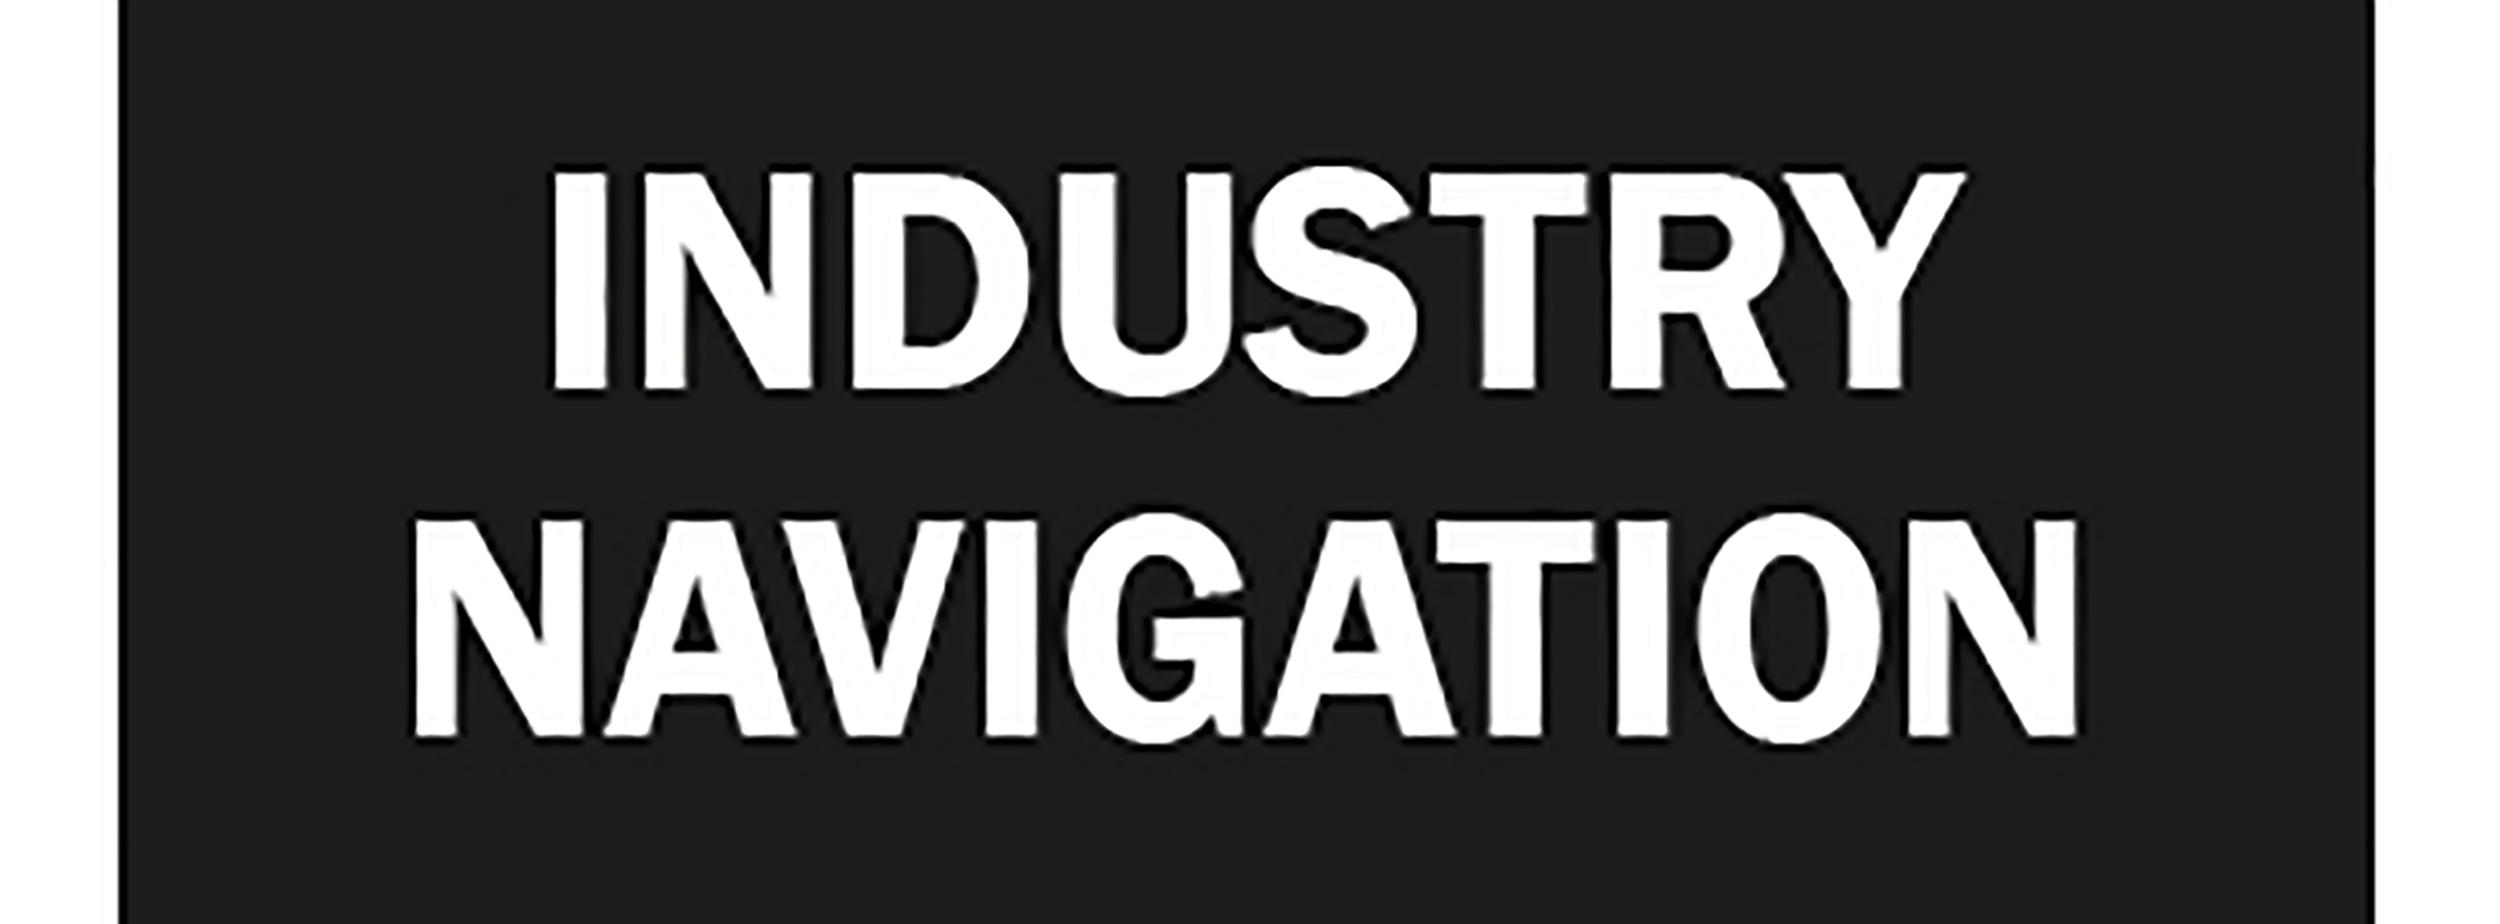 Industry Navigation BUTTON.jpg